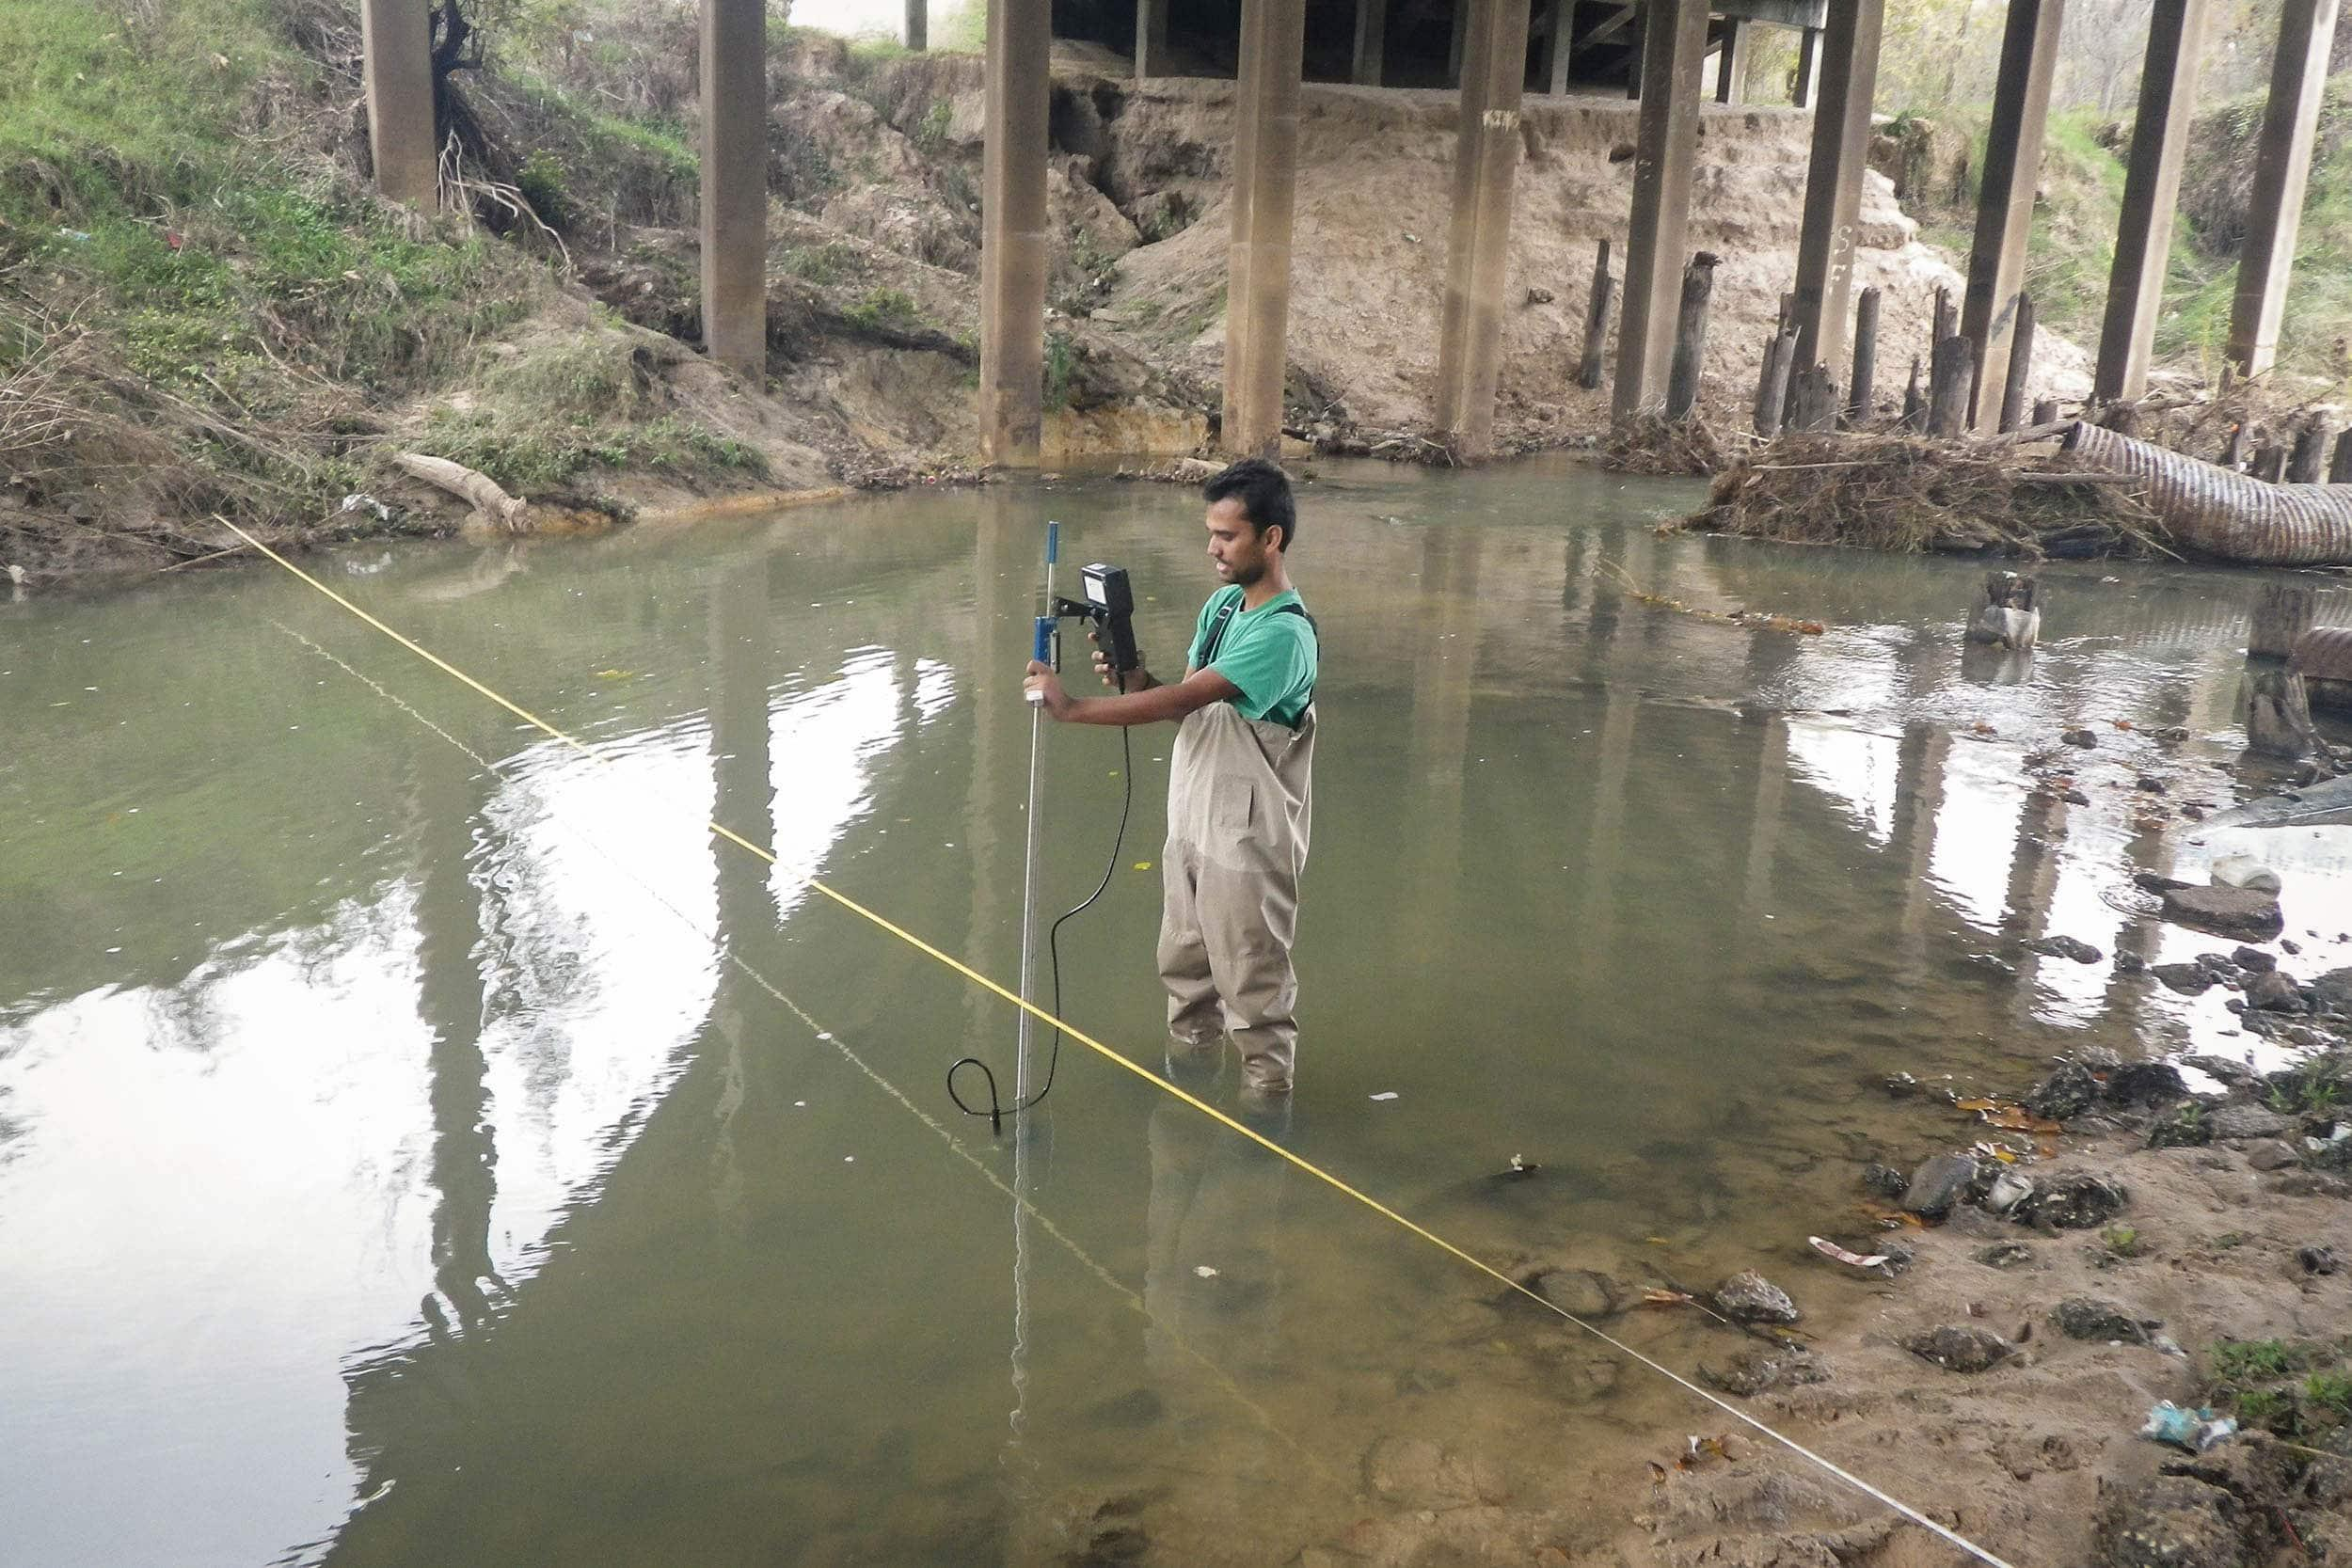 Khem Paudel uses the SonTek flow tracker to collect flow measurement data.